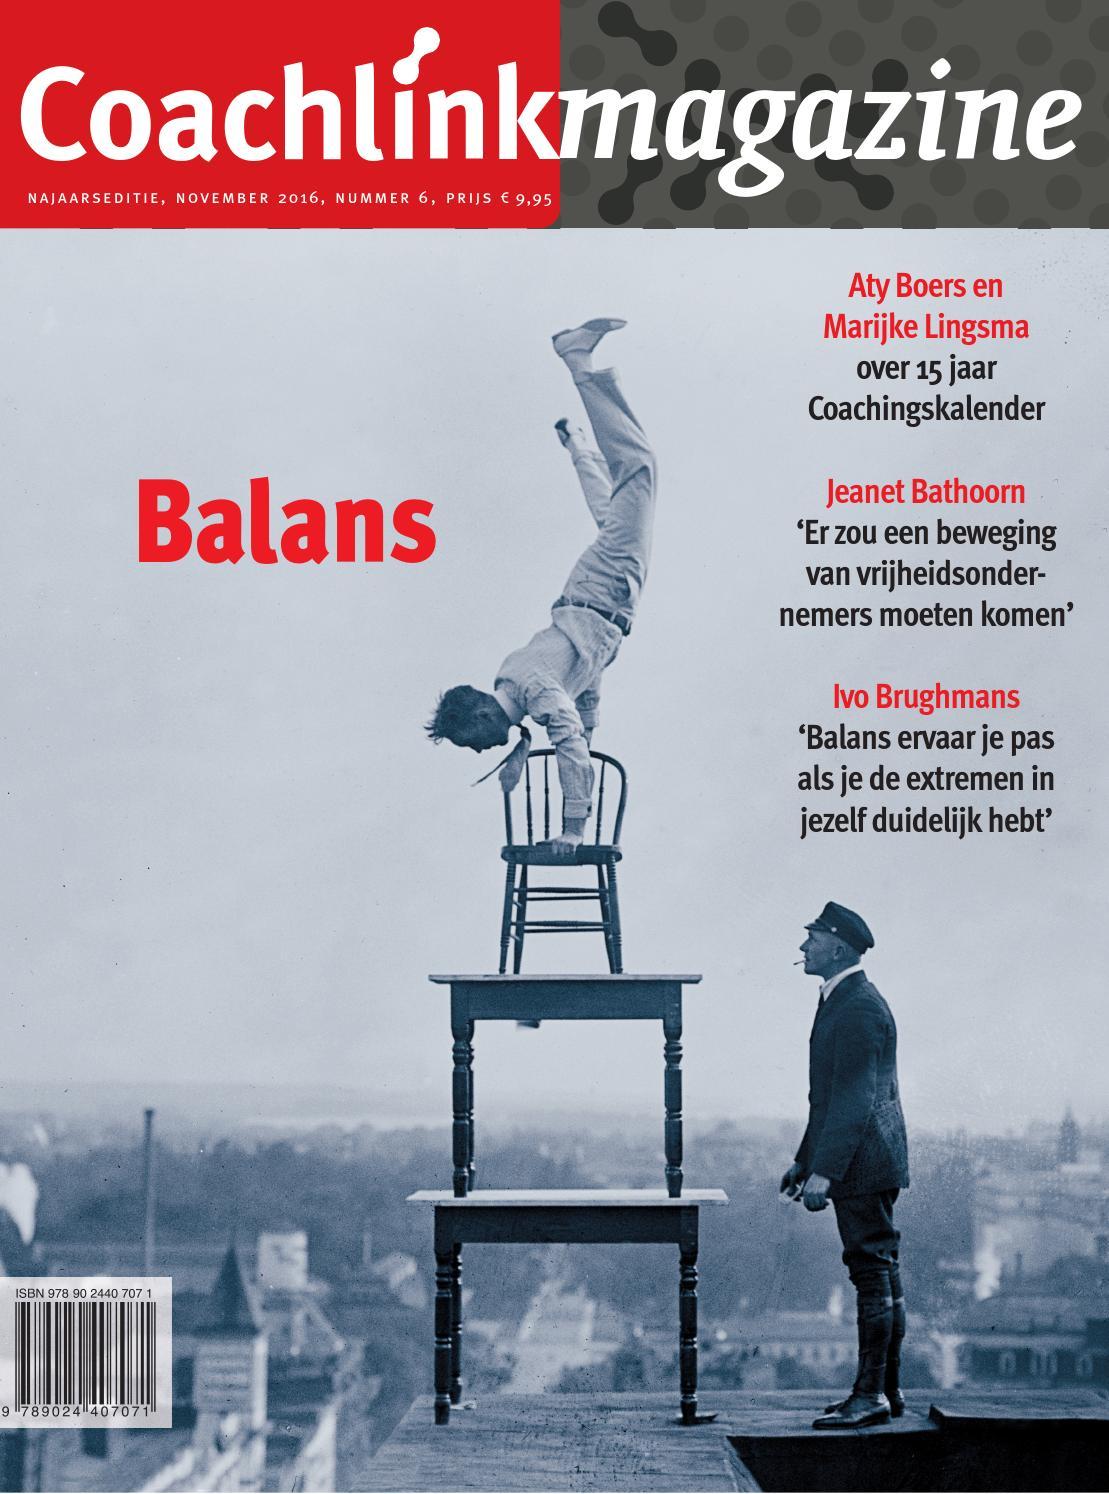 Coach link magazine